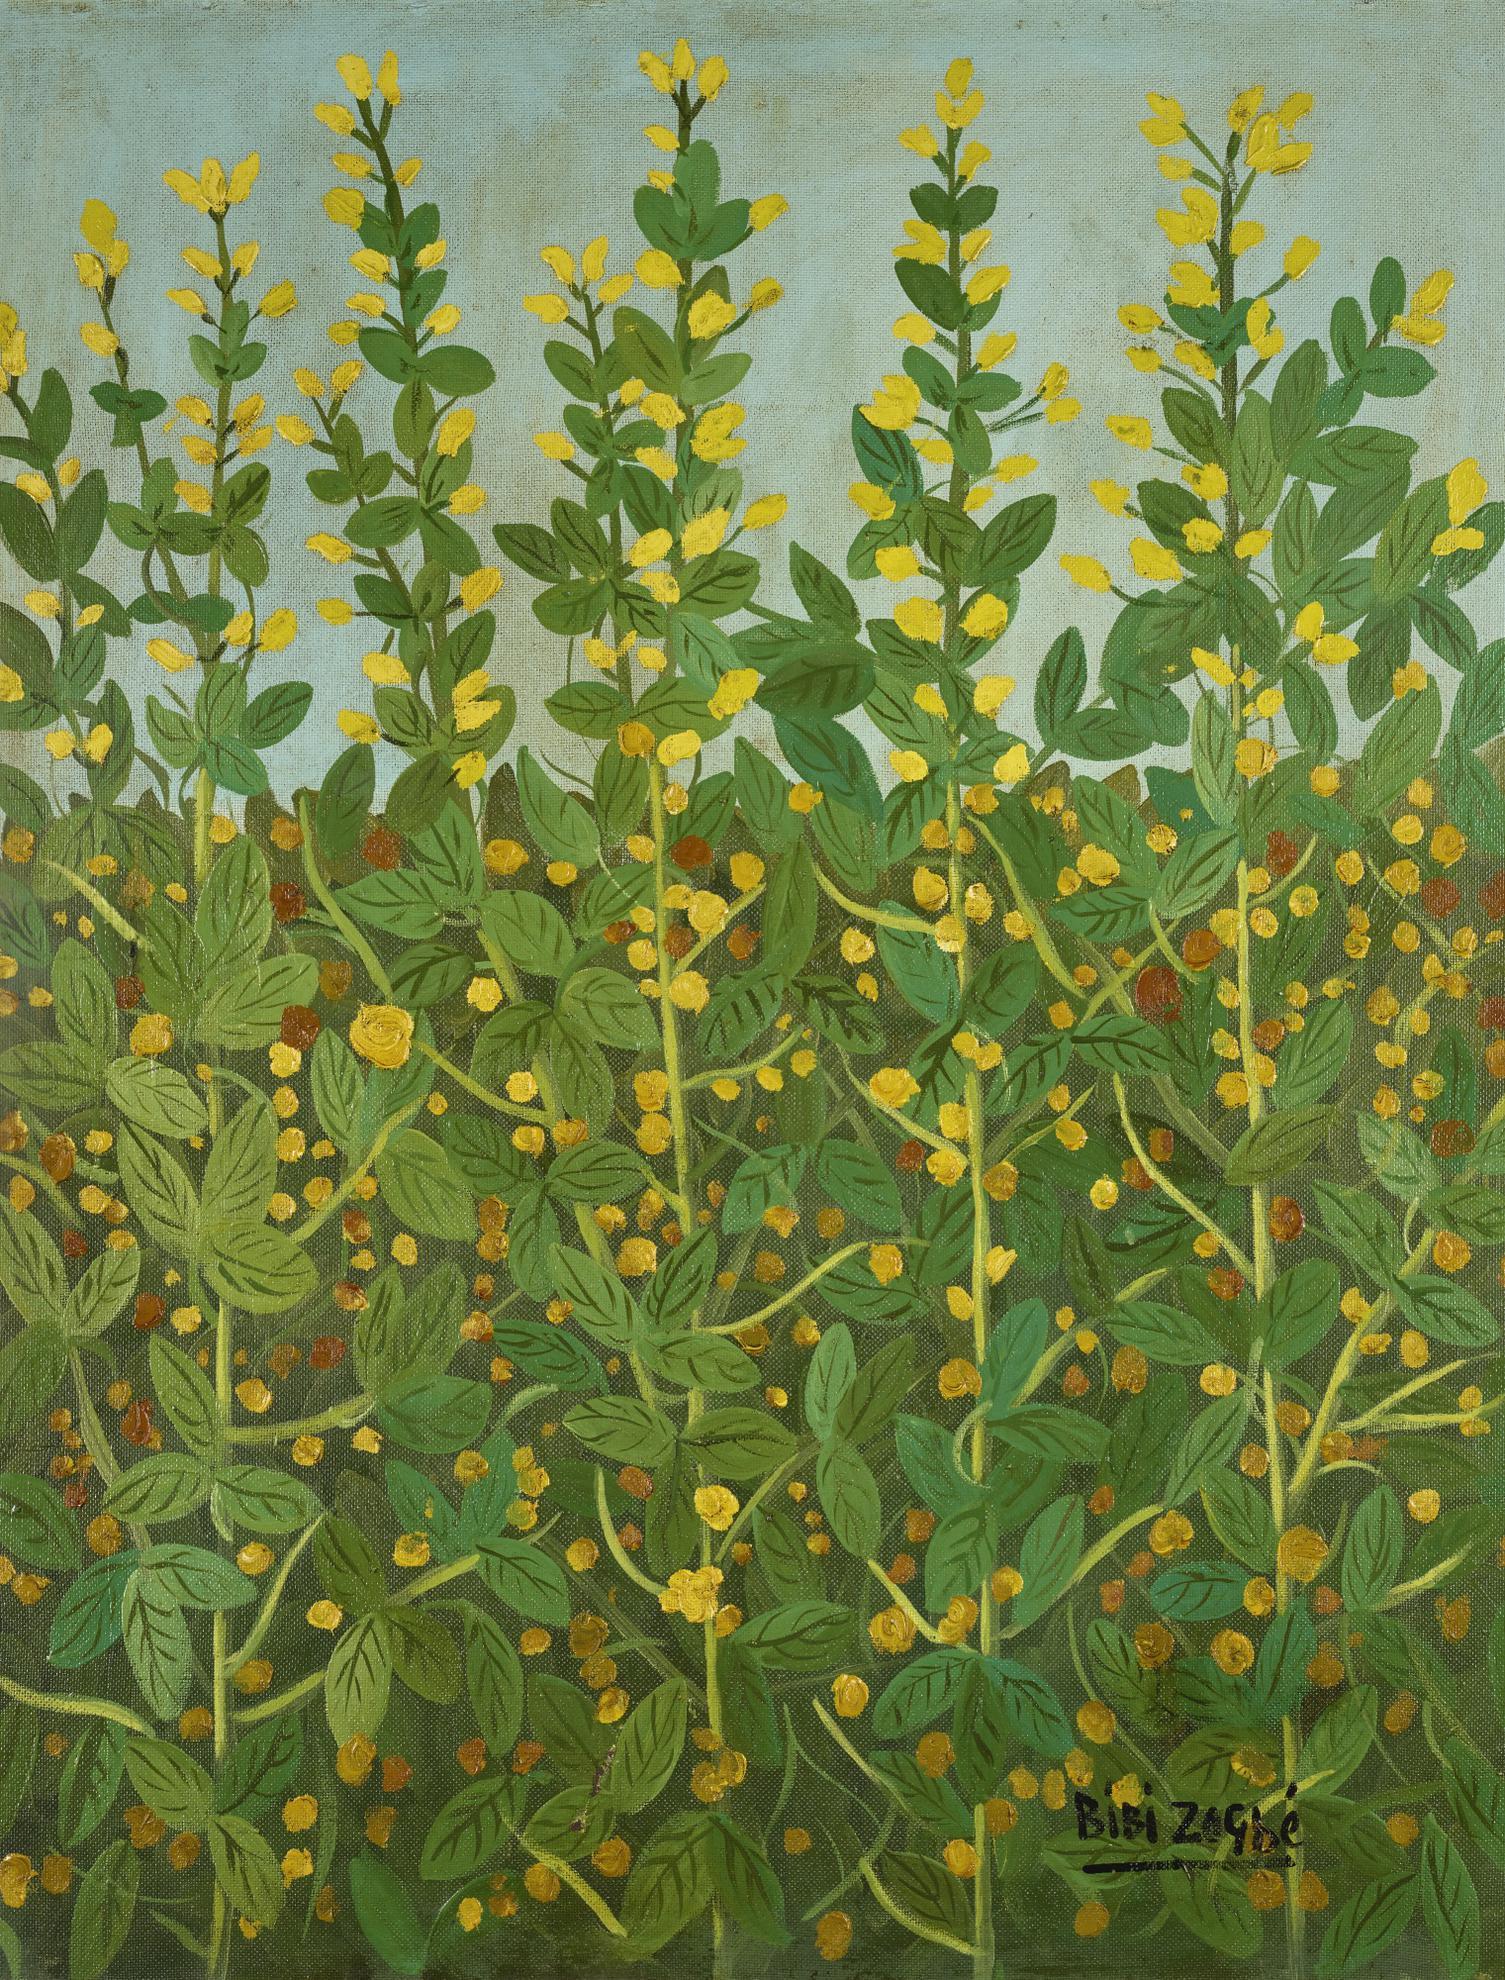 Bibi Zogbe - Flores De Campo (Field Flowers)-1950